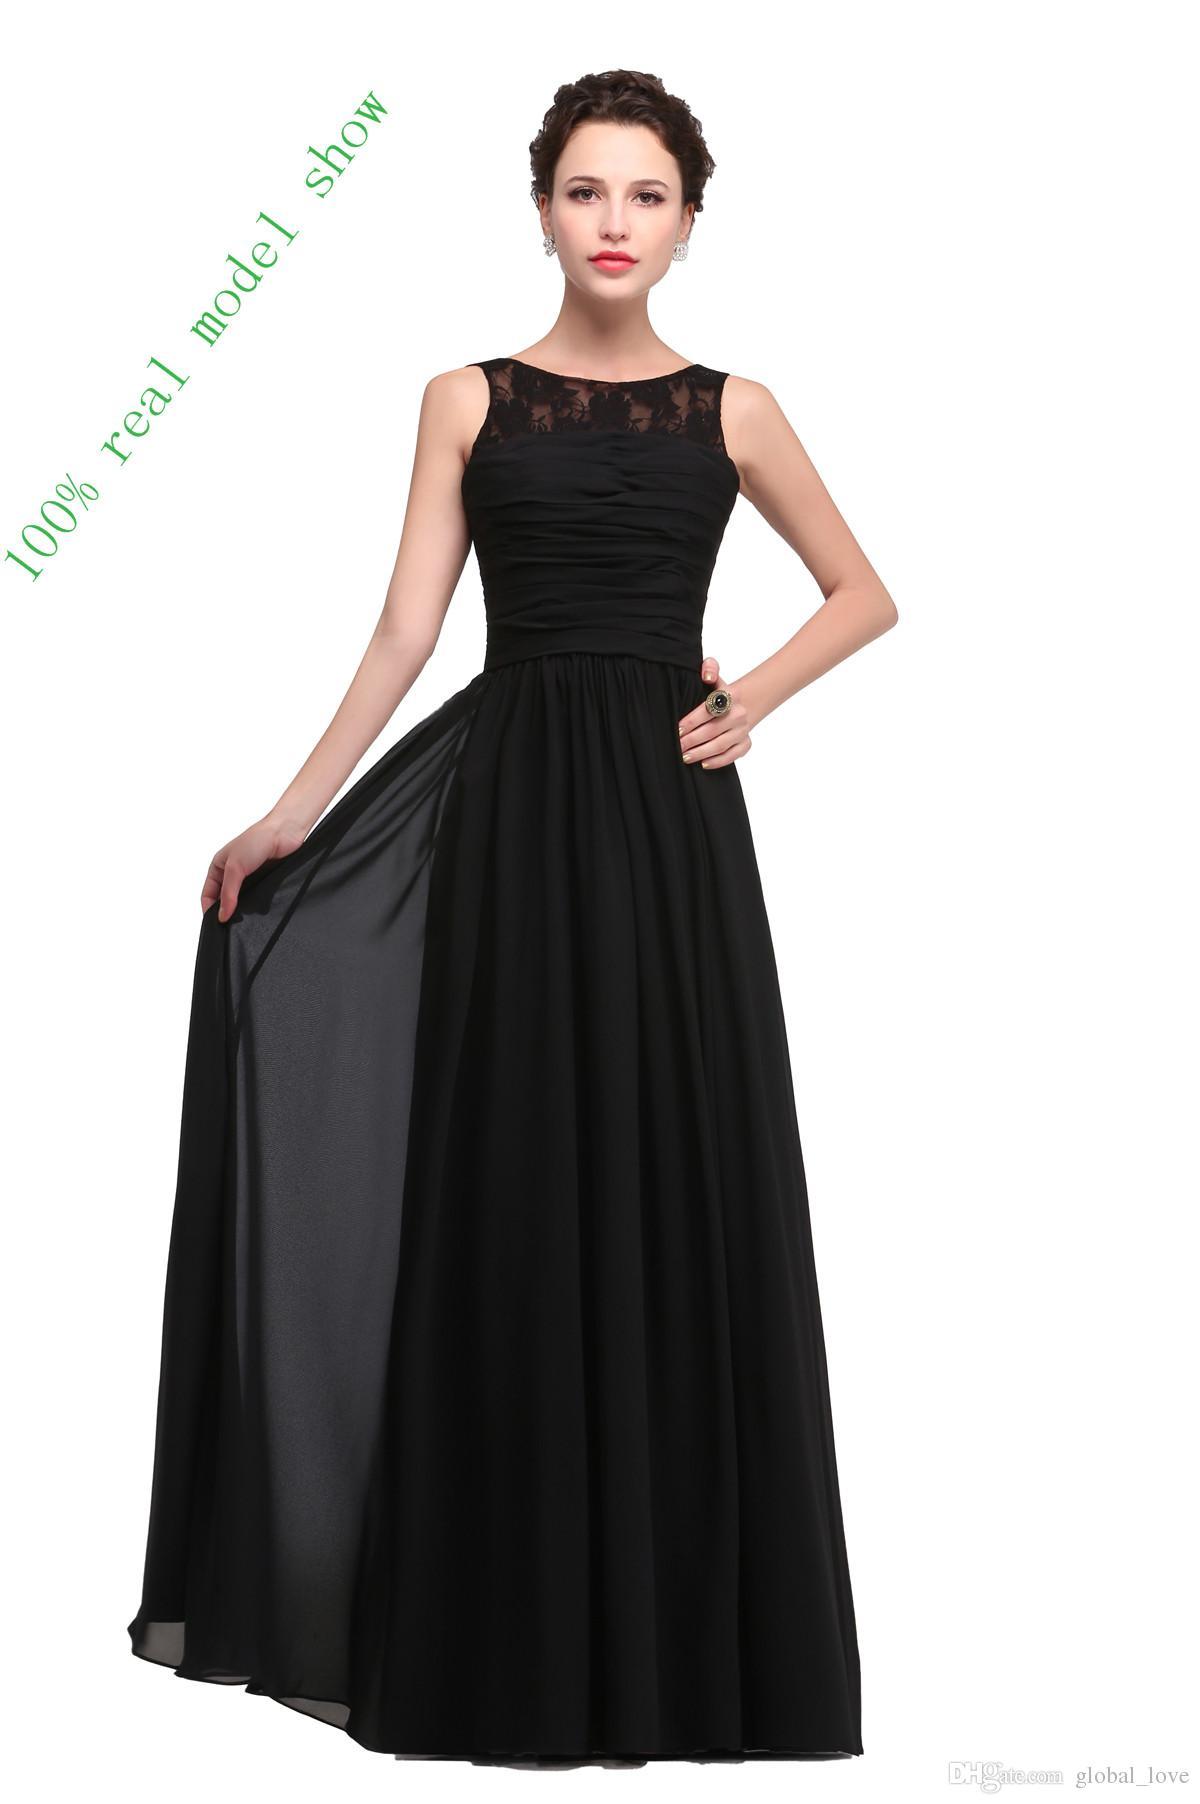 Truworths Dresses Related Keywords